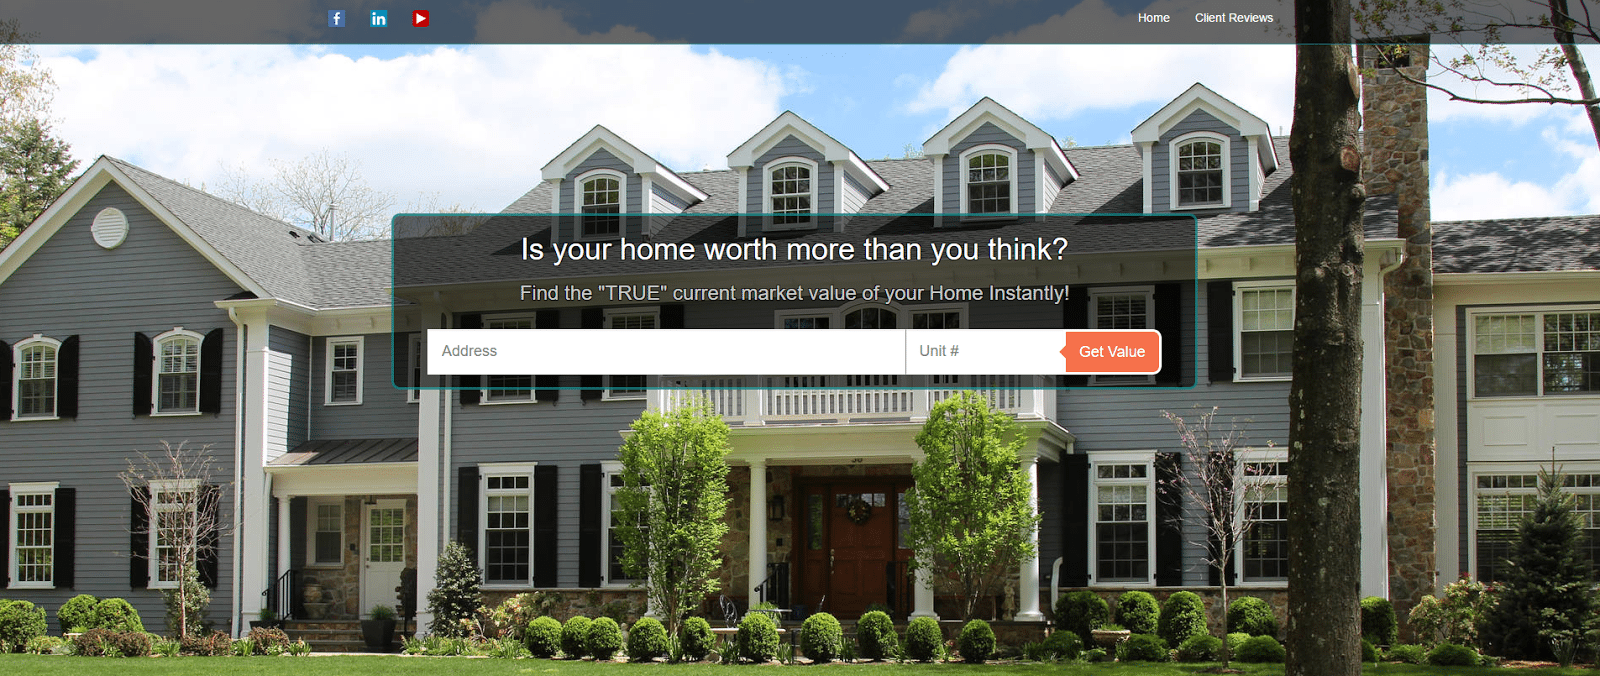 real estate lead generation service article -realgeeks screenshot